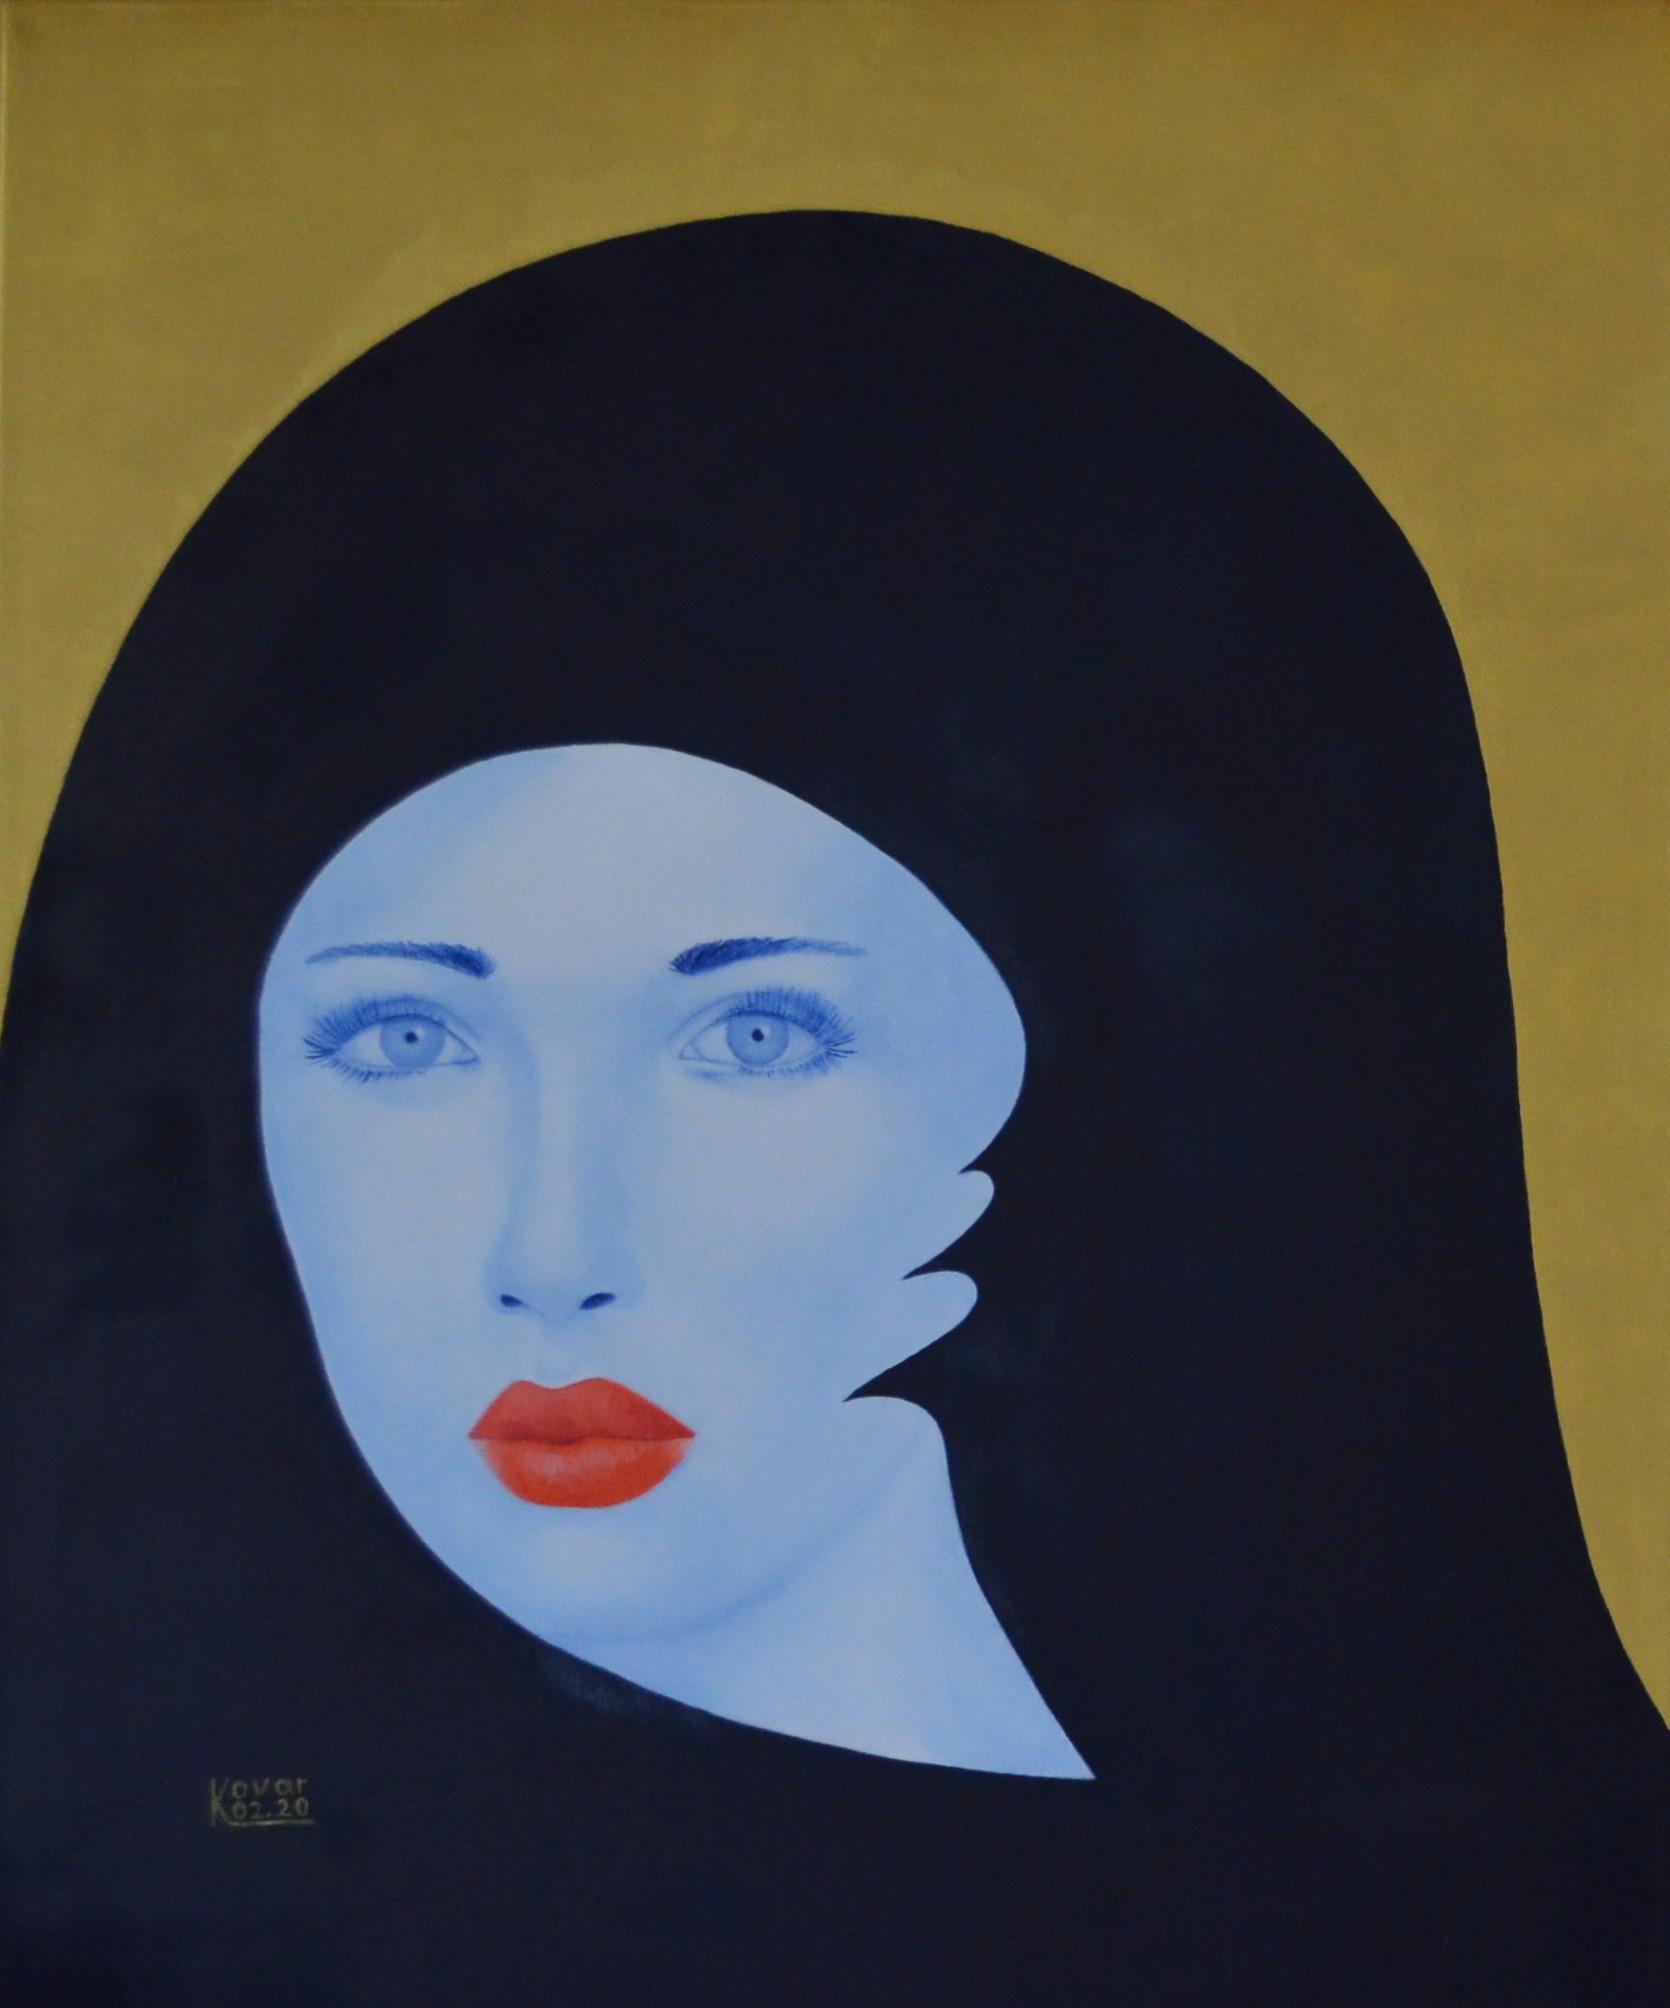 Märtyrer / Martyr,  Öl  auf Leinwand, 50 x 60 cm, 2020, Oil on canvas.